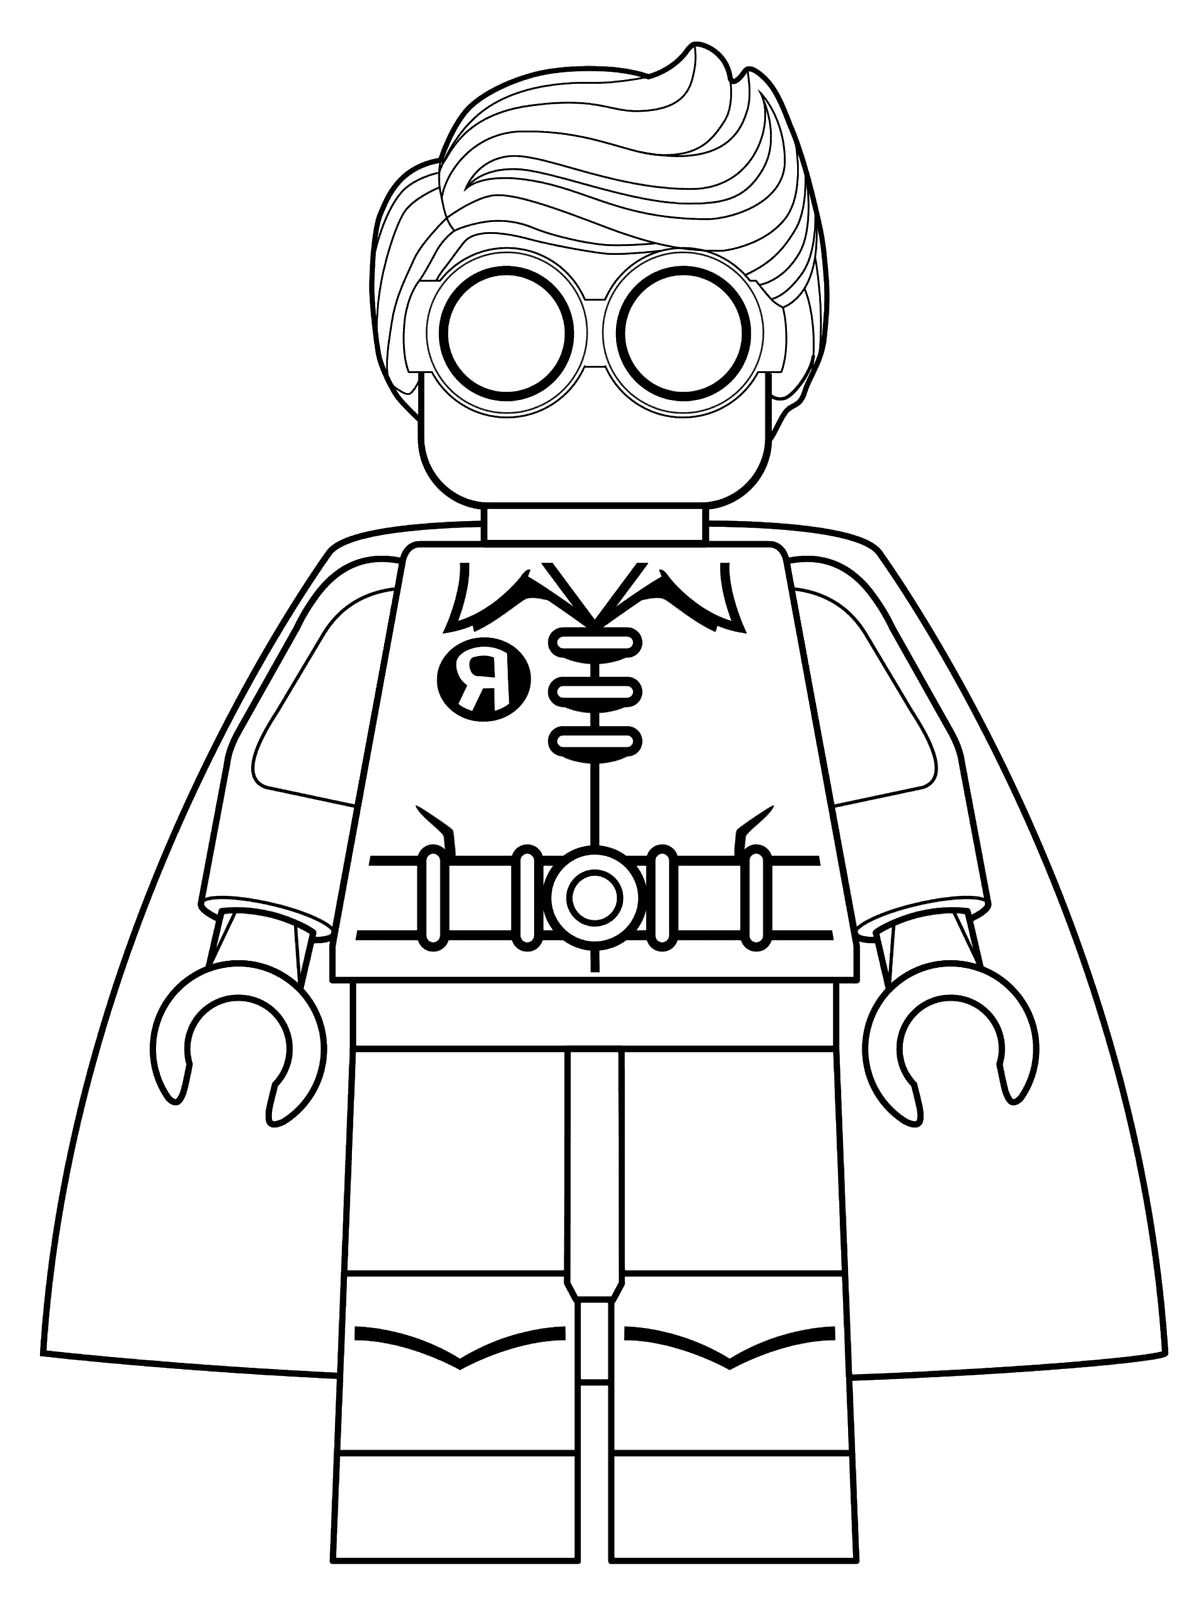 Desenho De Lego Batman Para Colorir